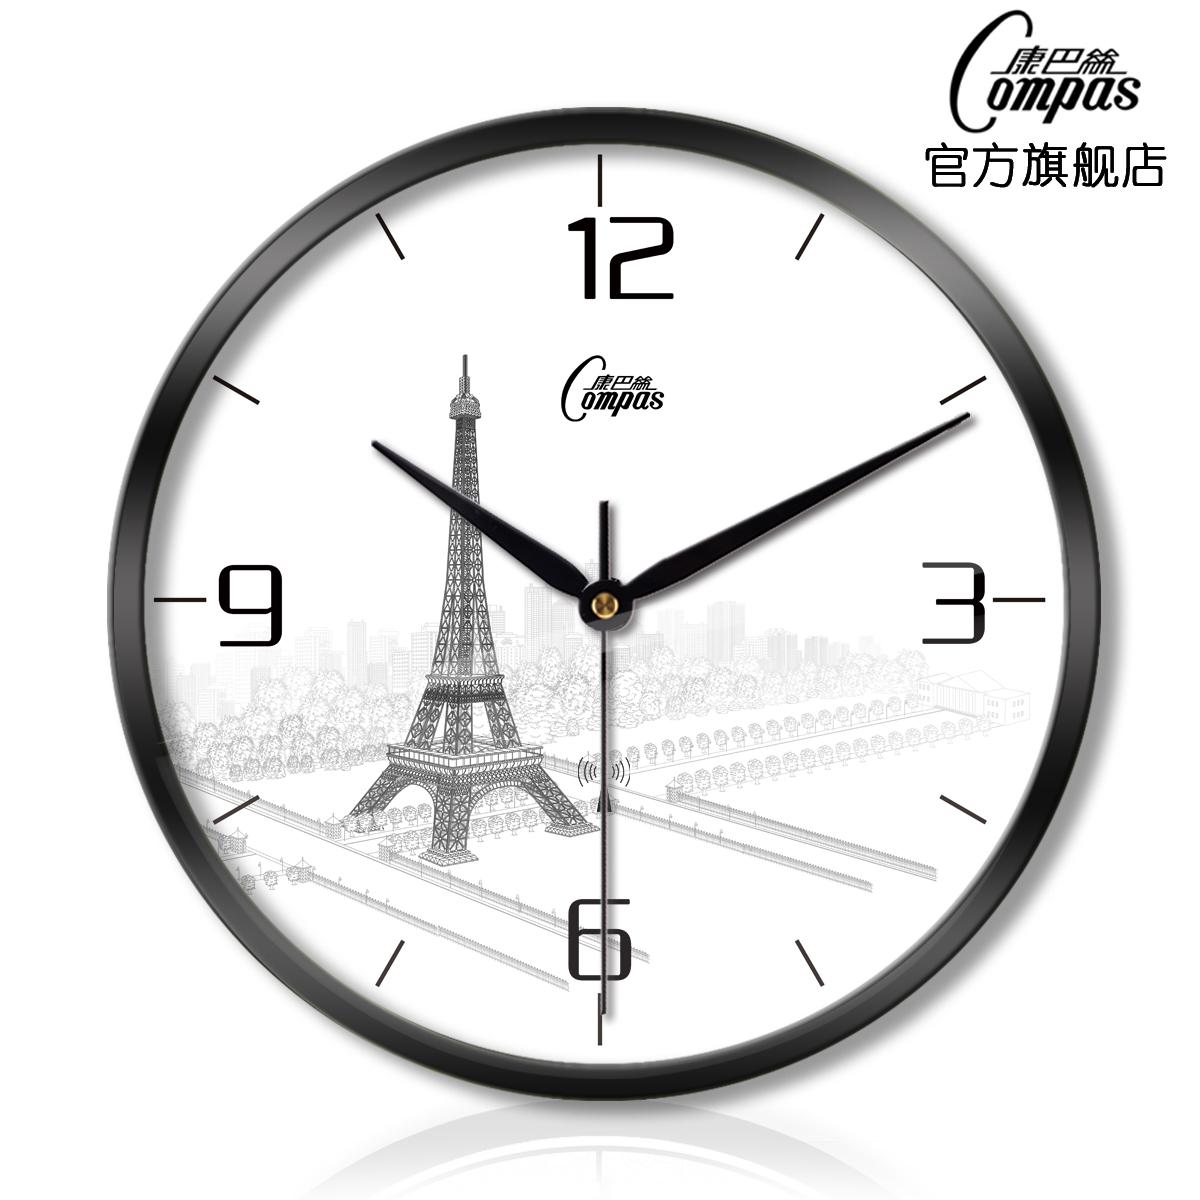 Clocks metal wall clock quieten second generation intelligent radio controlled clock 421(China (Mainland))